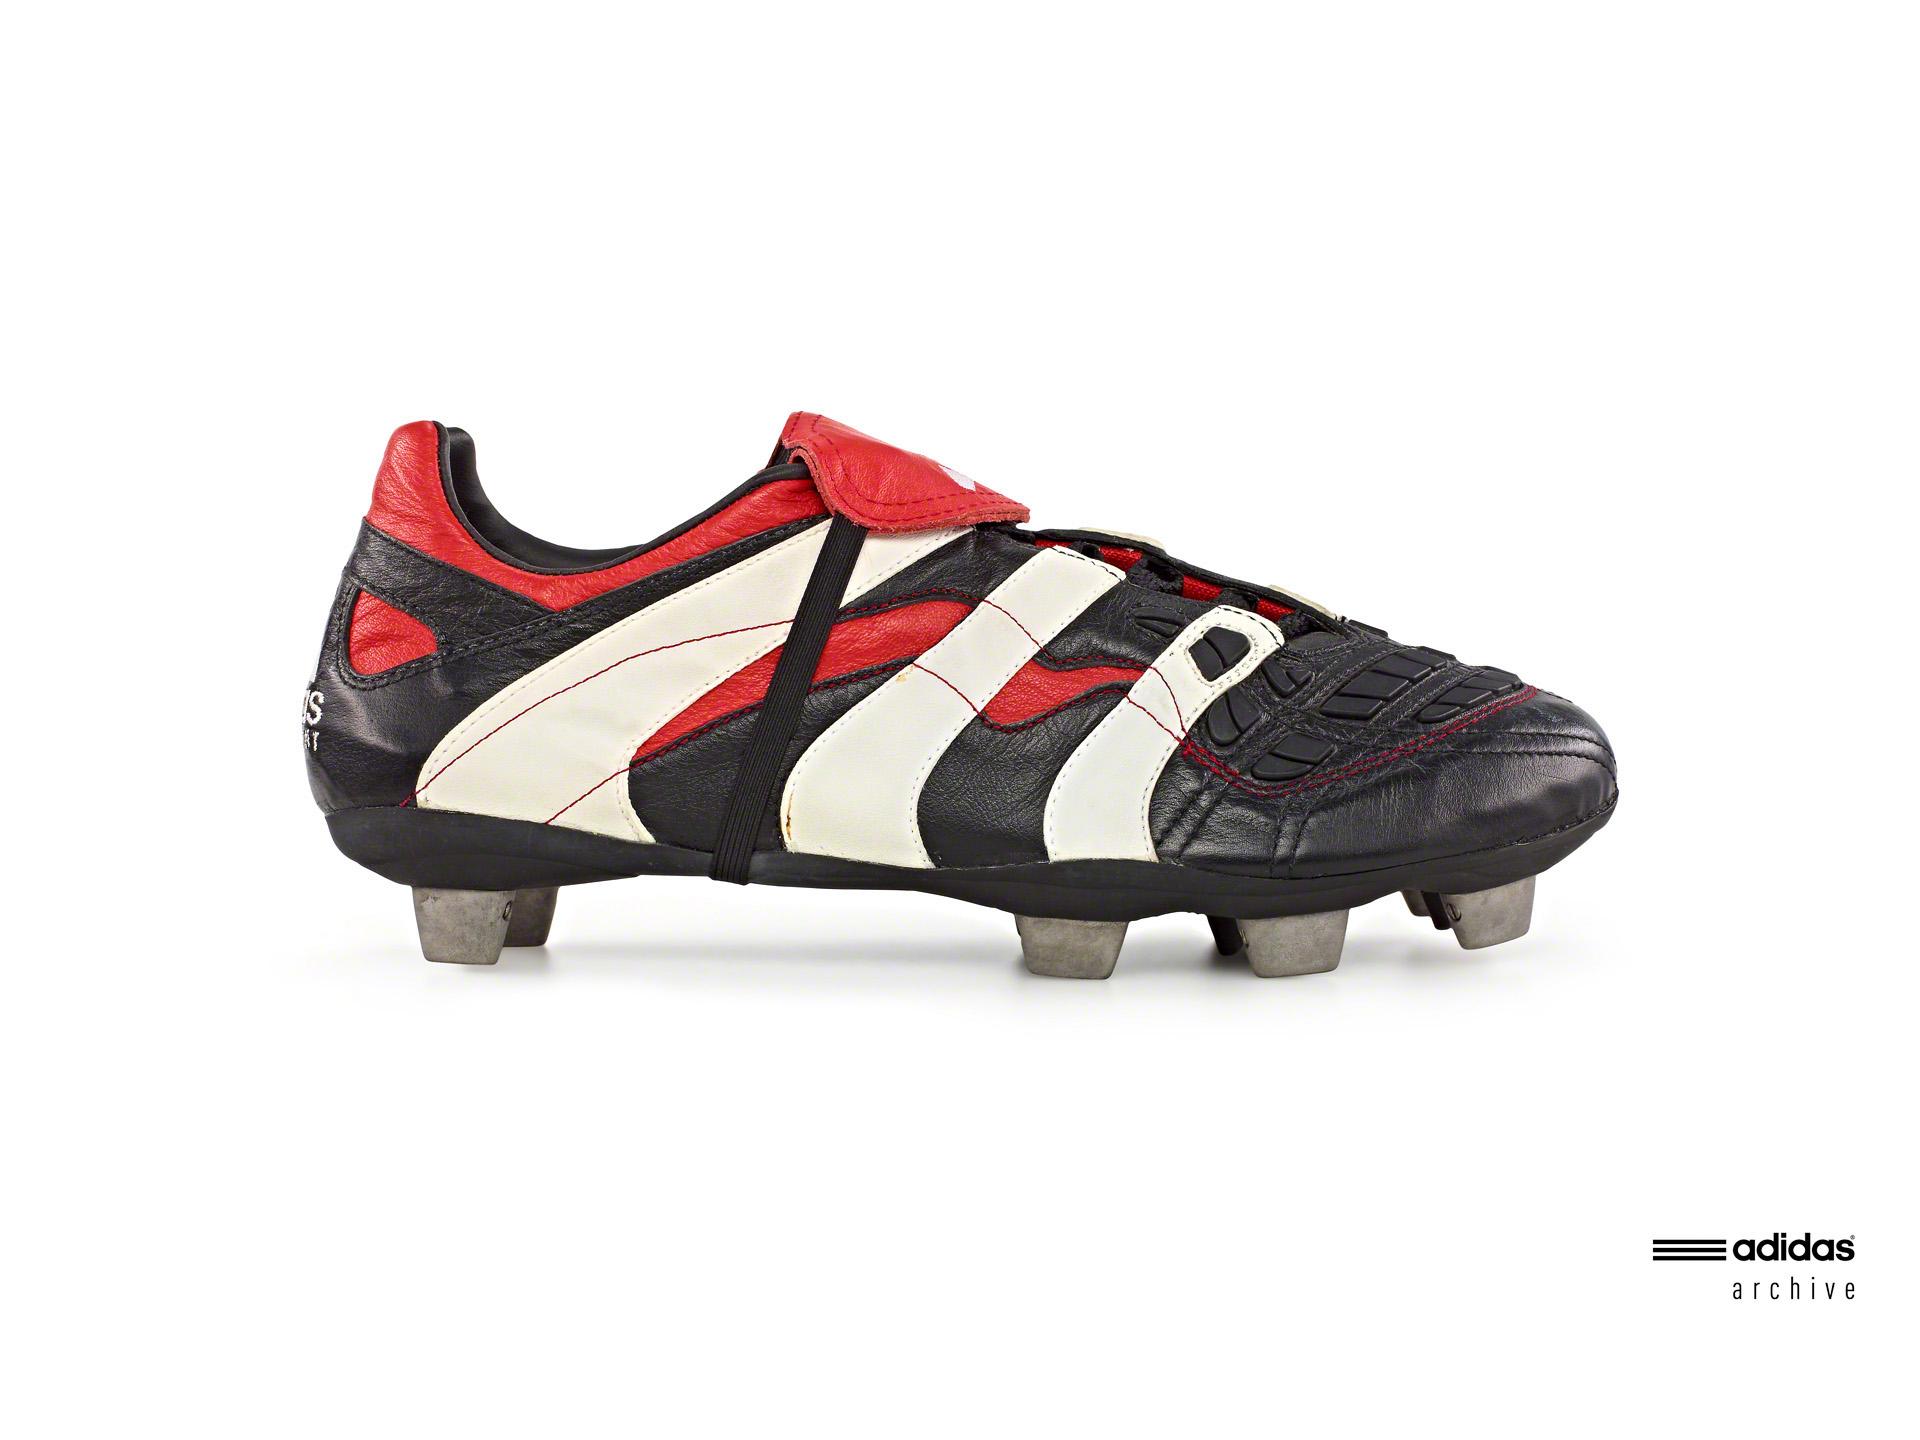 Adidas Predator: Every edition of the